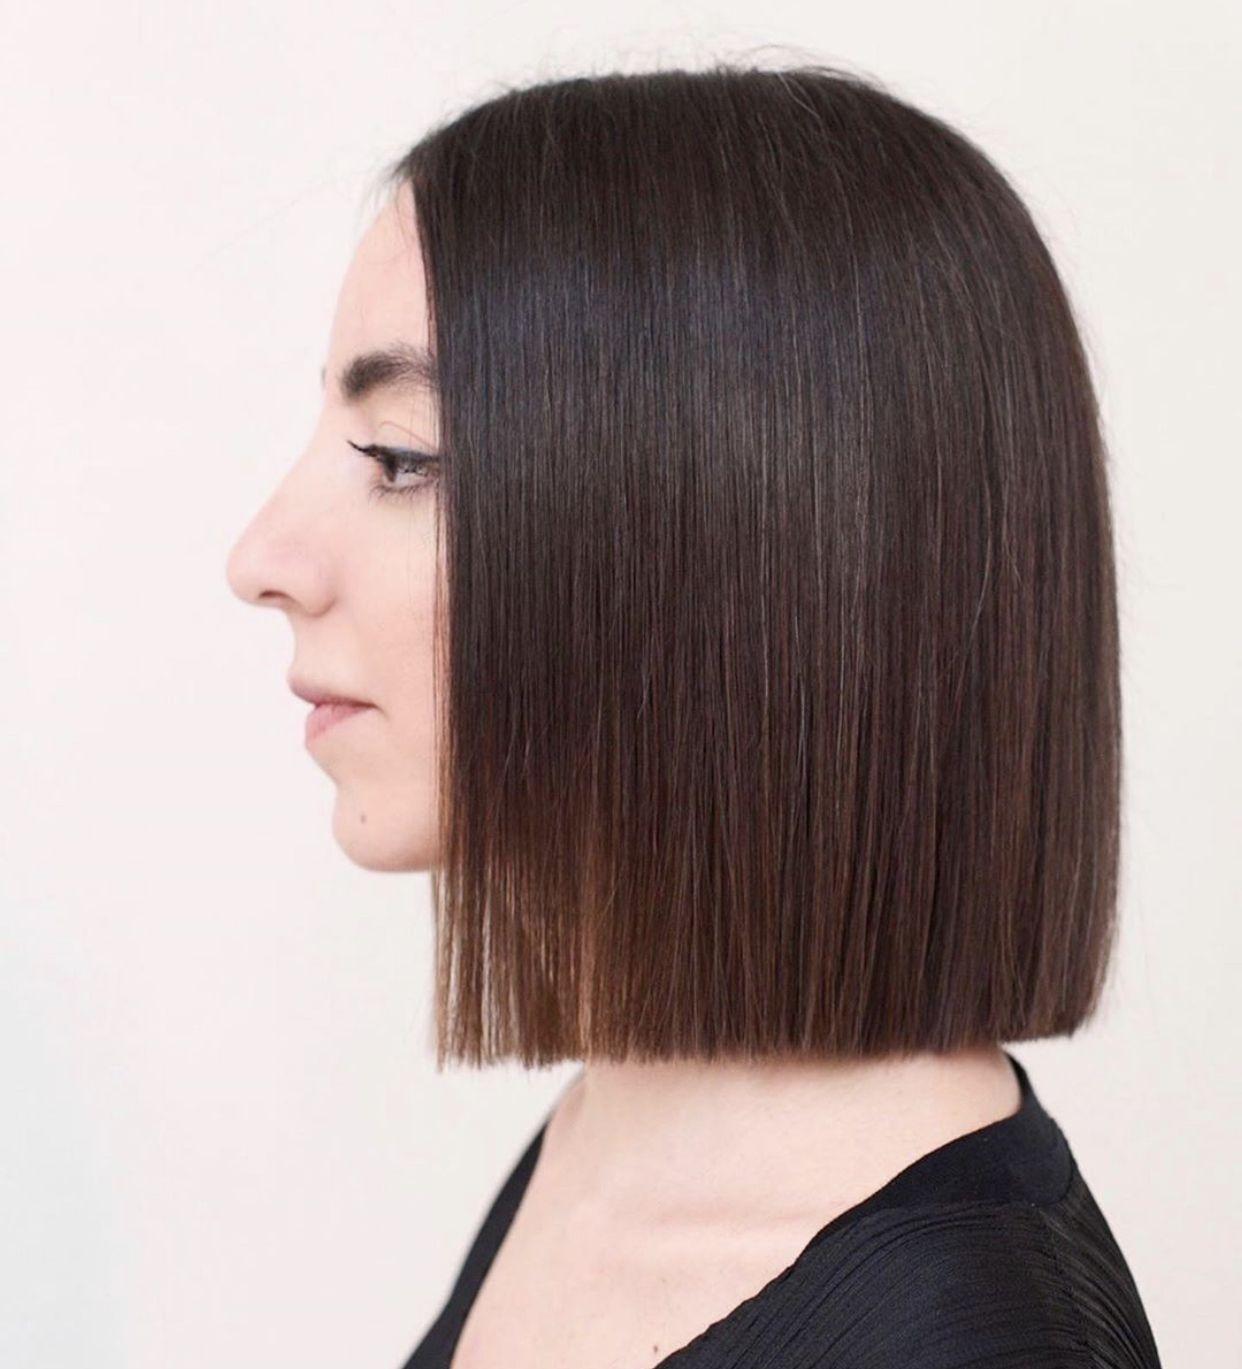 Soft Blunt In 2020 Thin Straight Hair Medium Hair Styles Hair Styles